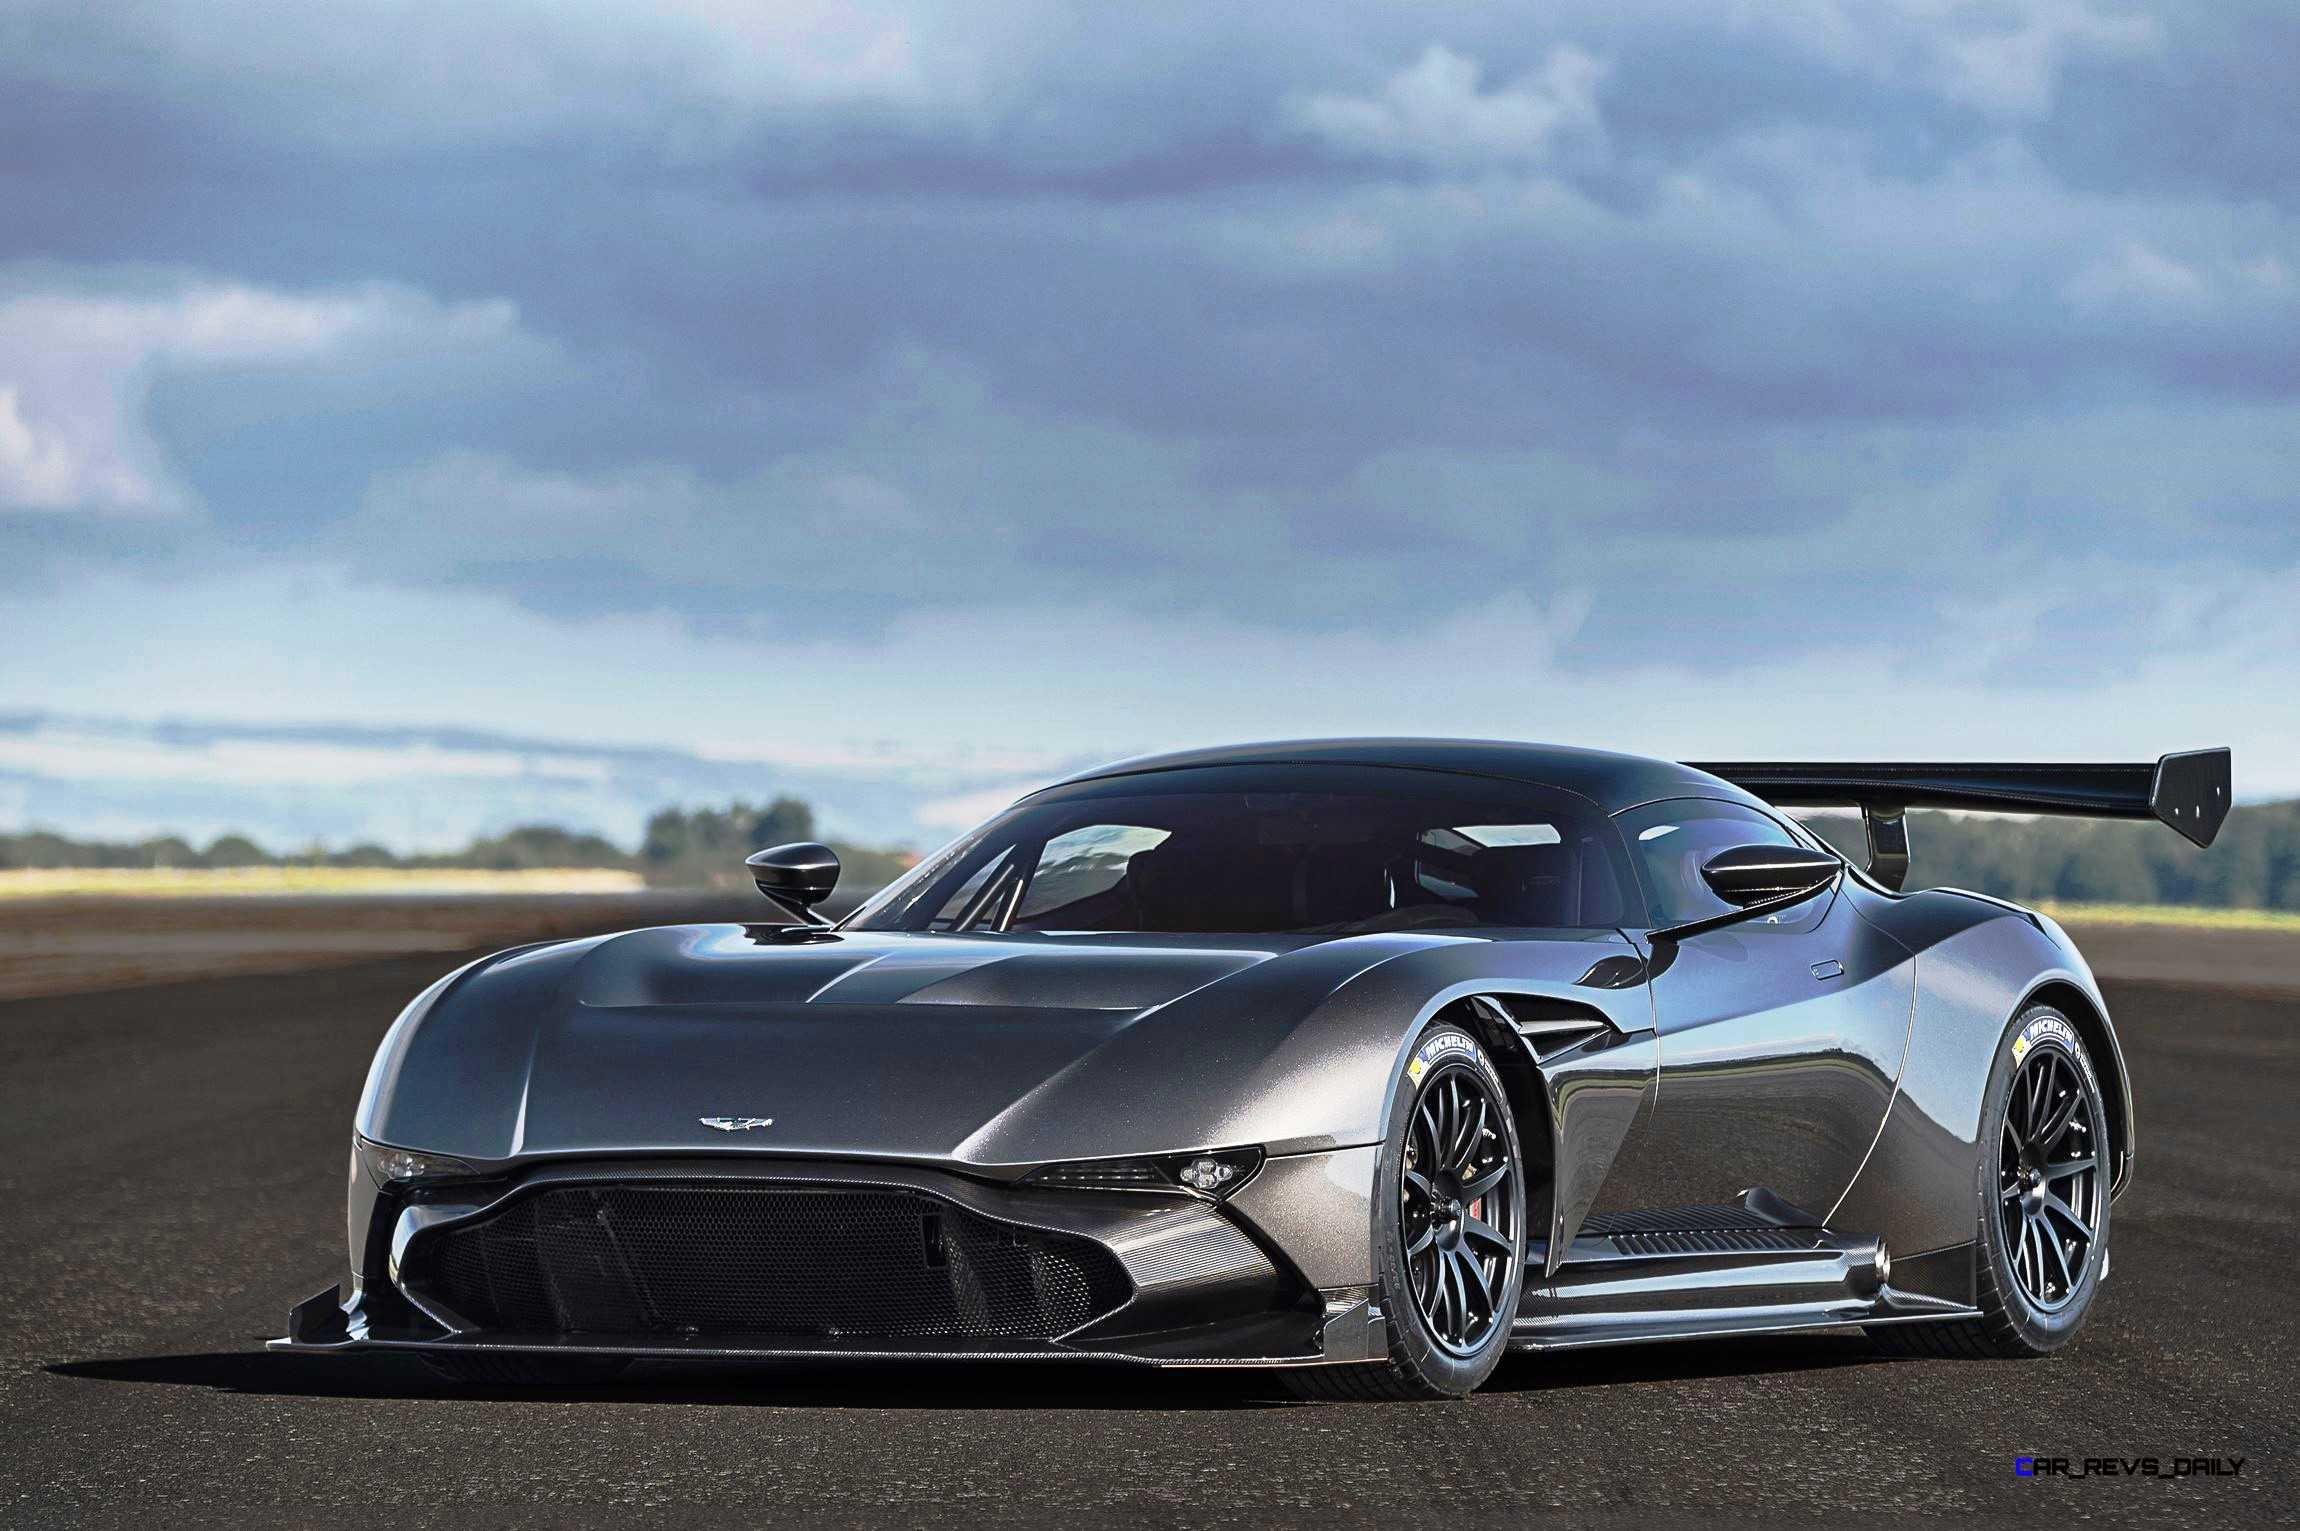 2016 Aston Martin VULCAN Meets Legendary Avro Vulcan Namesake